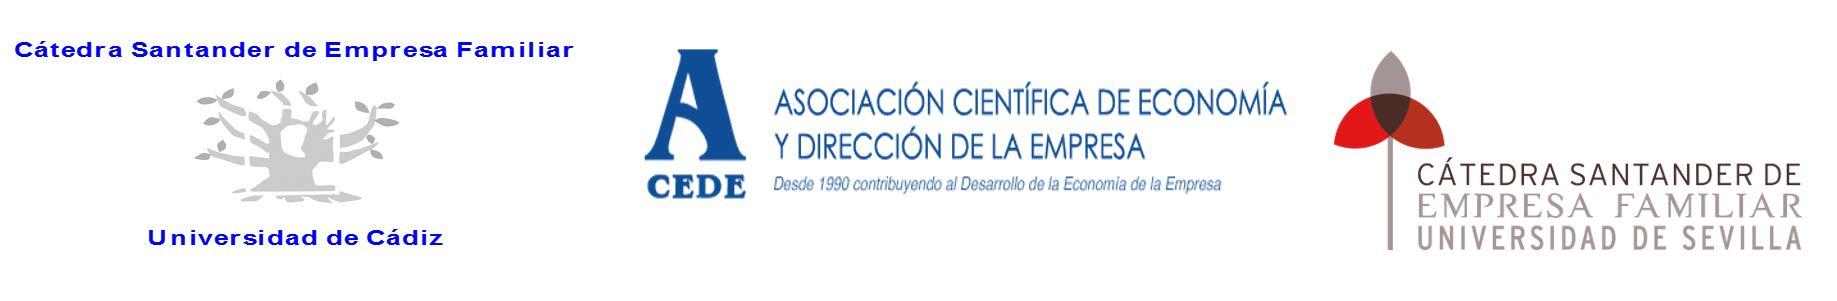 ACEDE Sevilla Empresa Familiar Cátedra